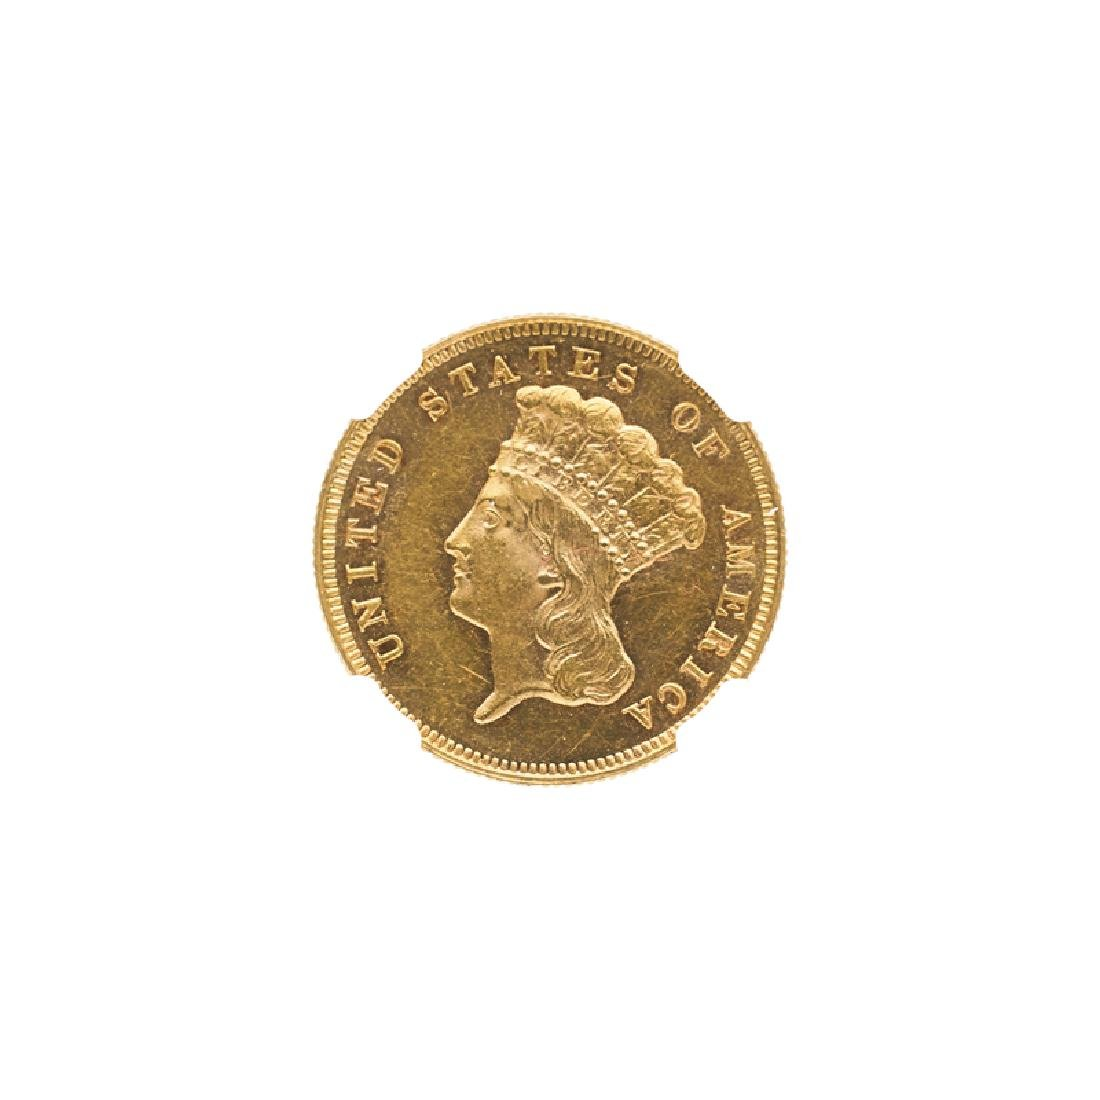 U.S. 1881 $3.00 GOLD COIN